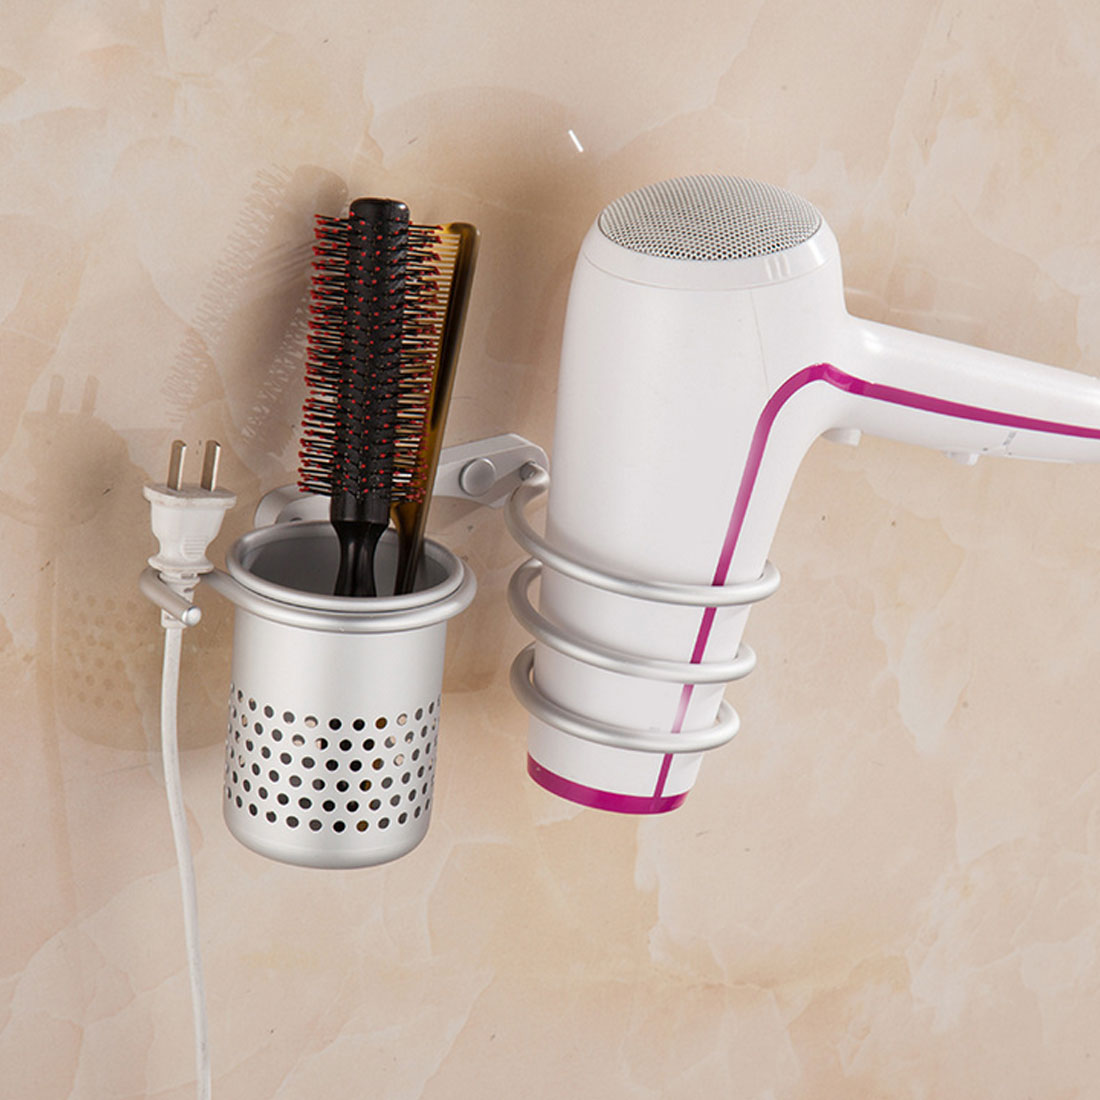 Heimwerker Badezimmer Regale Innovative Wand Haar Trockner Metall Bad Regal Lagerung Haartrockner Halter Für Haartrockner